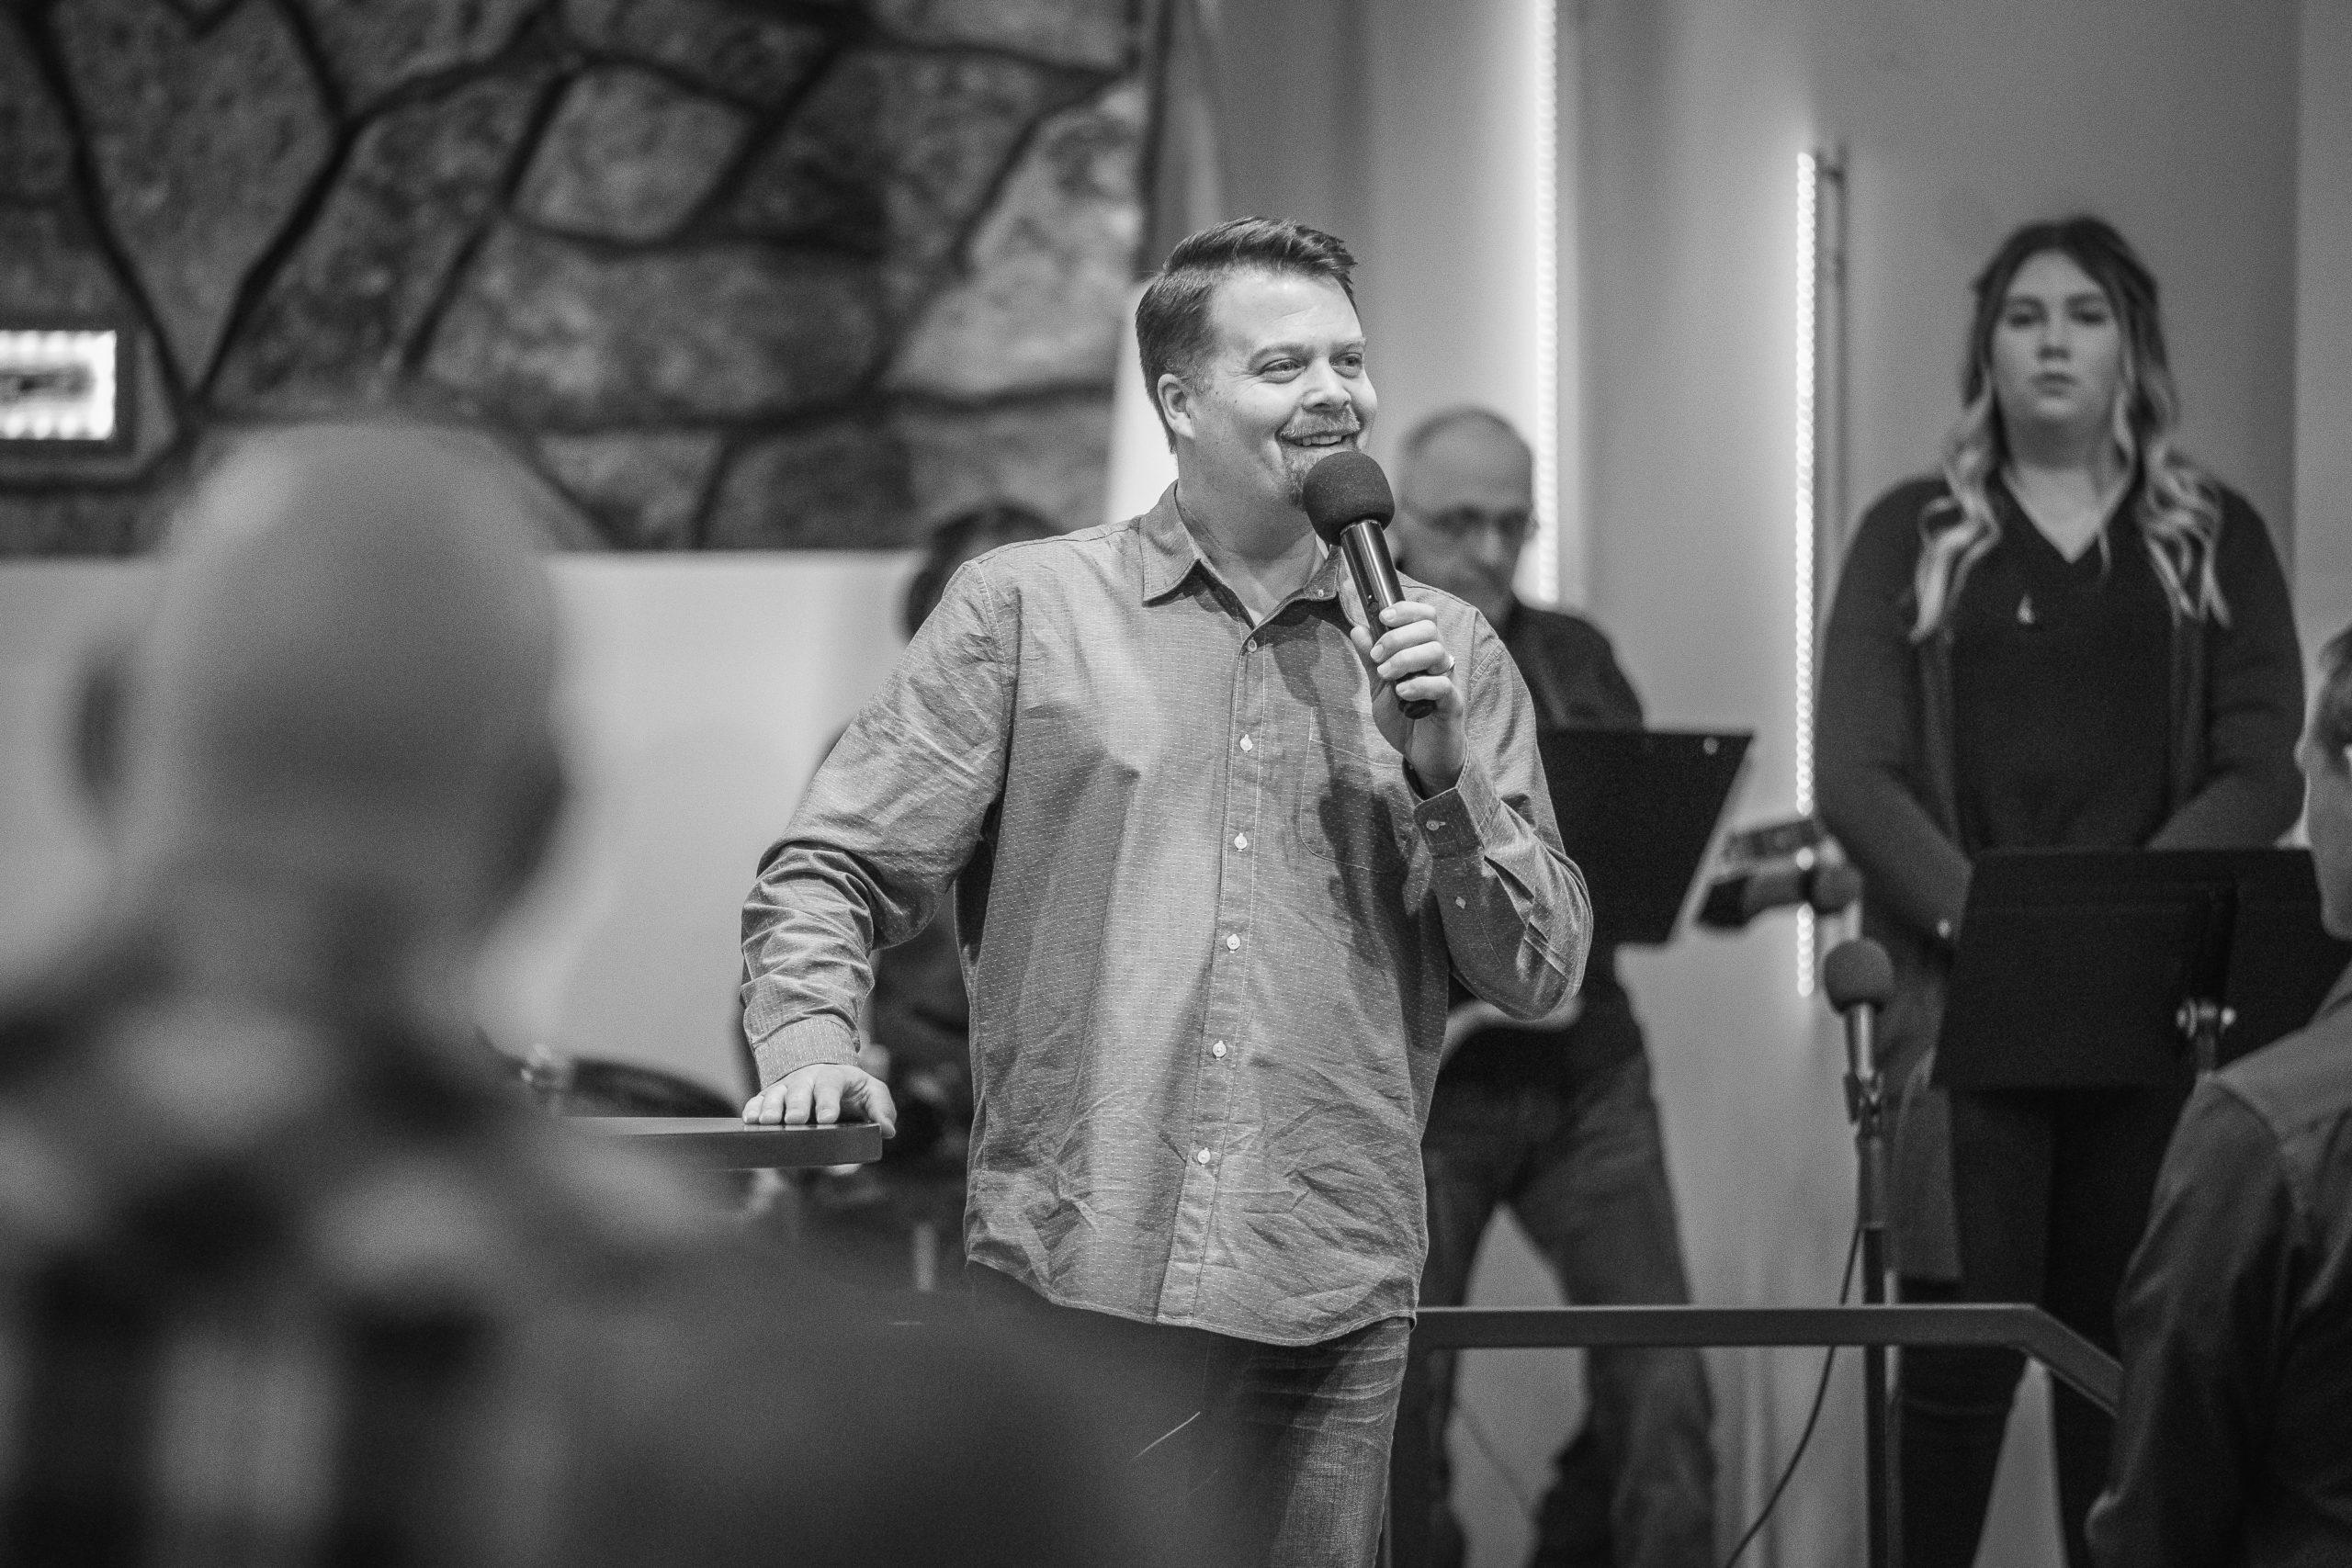 Events at Faith Family Billings Church, Billings, MT